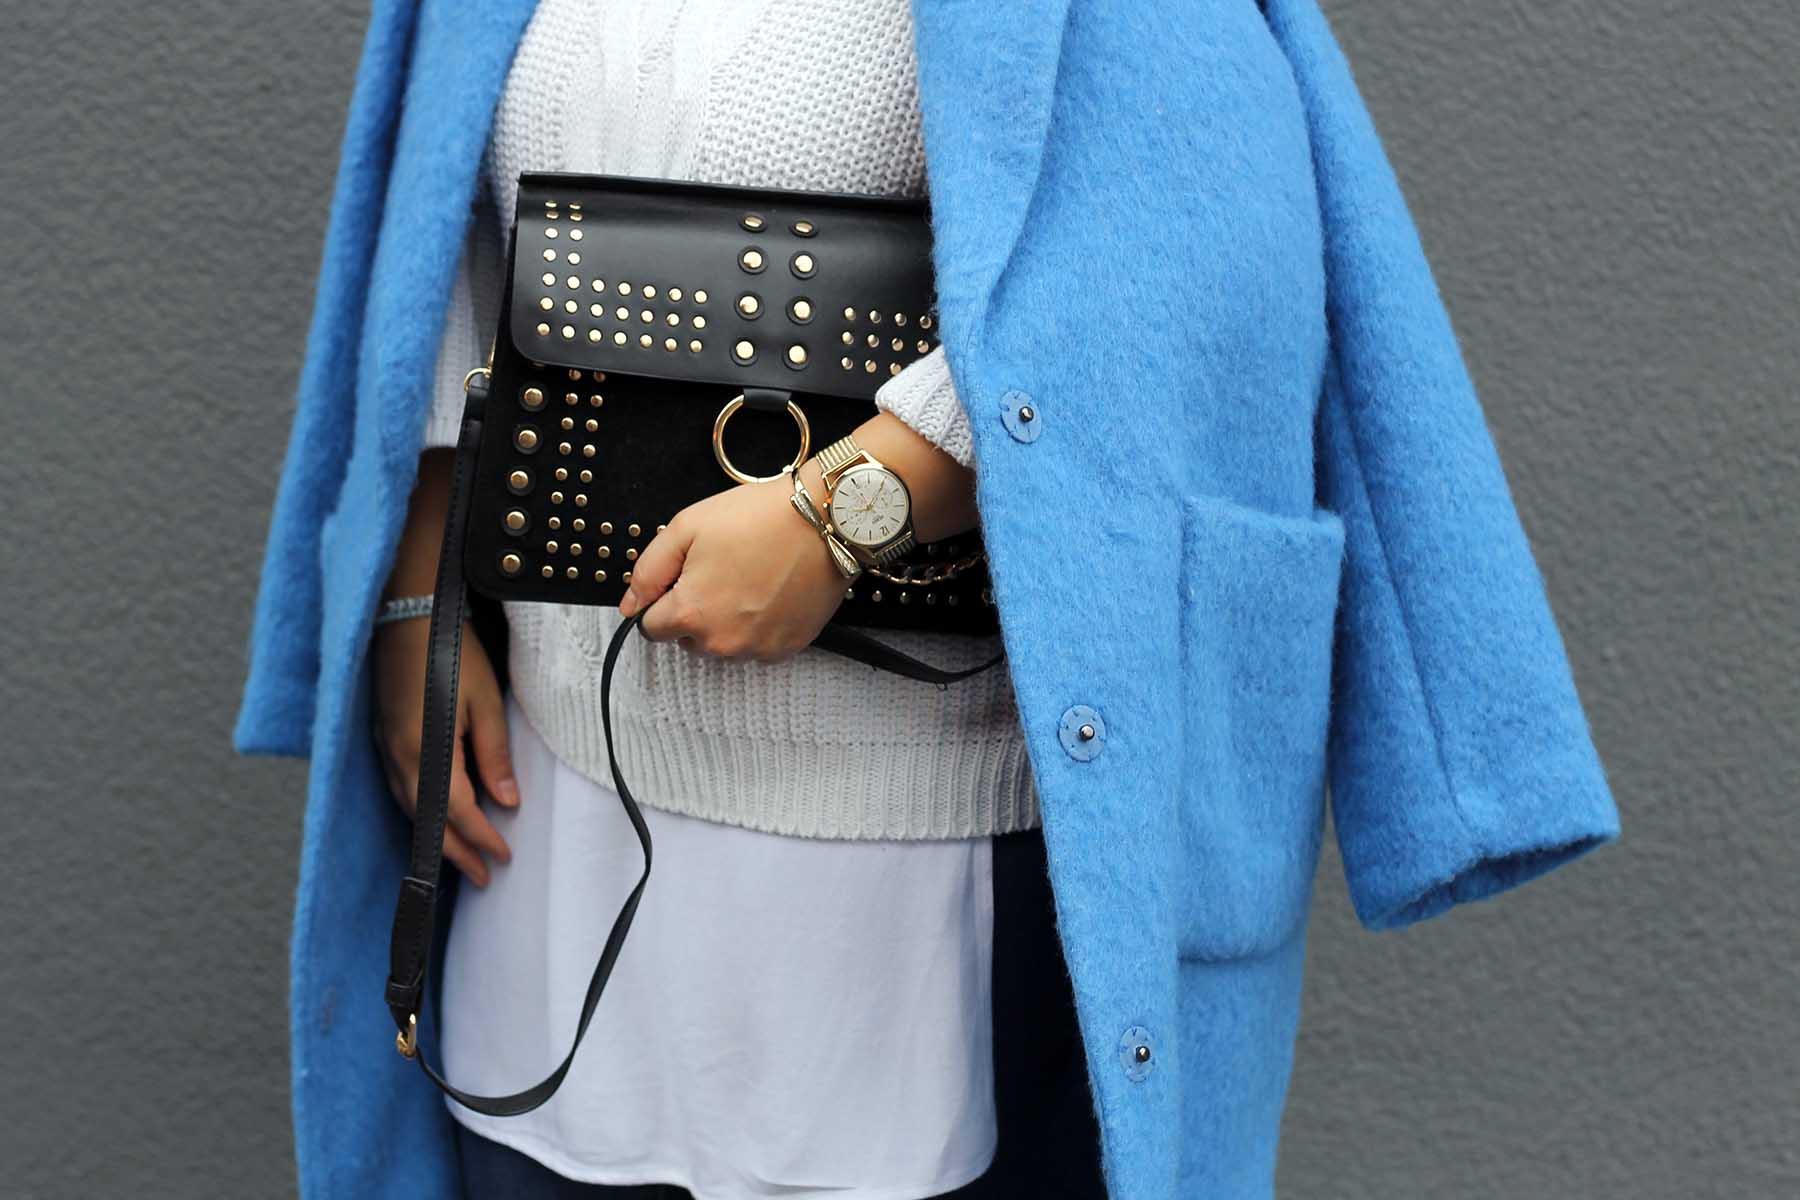 outfit-look-style-modeblog-fashionblog-blauer-mantel-jeans-balenciaga-lookalike-boots-chloe21